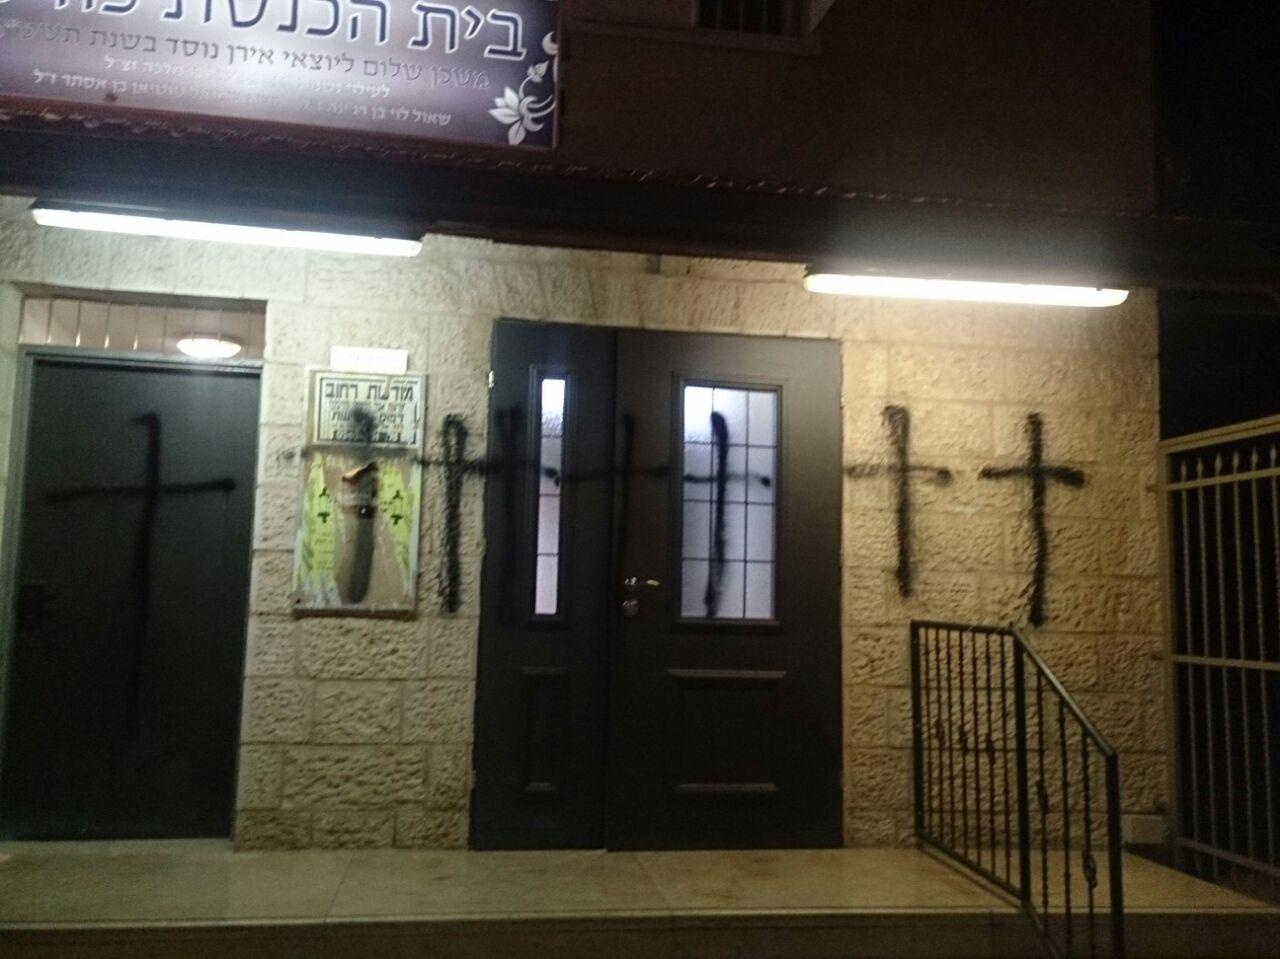 Yerushalayim: Crosses on a Shul